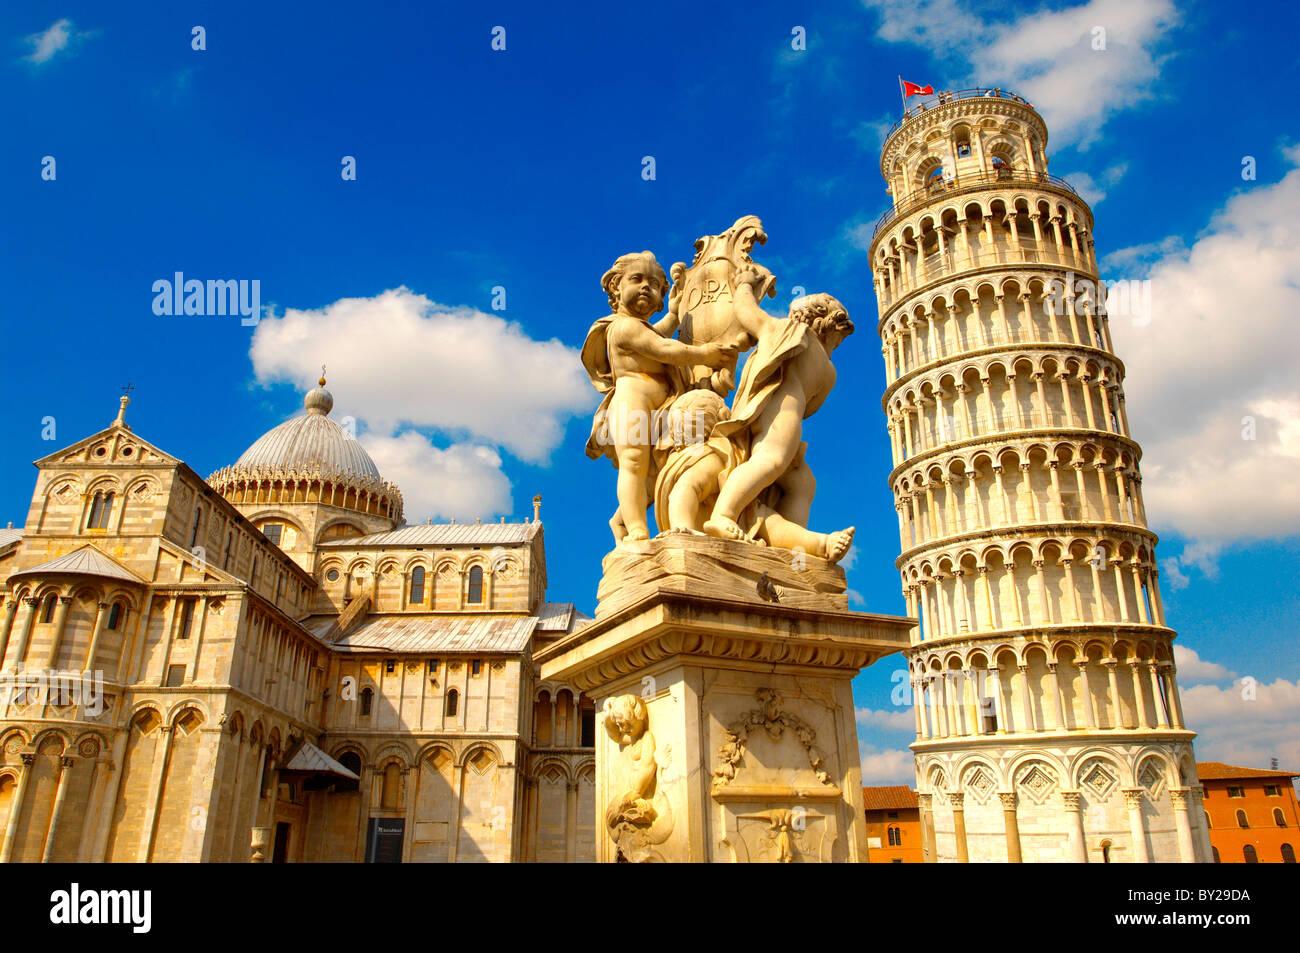 Catherderal und schiefen Turm - Piazza del Miracoli - Pisa - Italien Stockbild